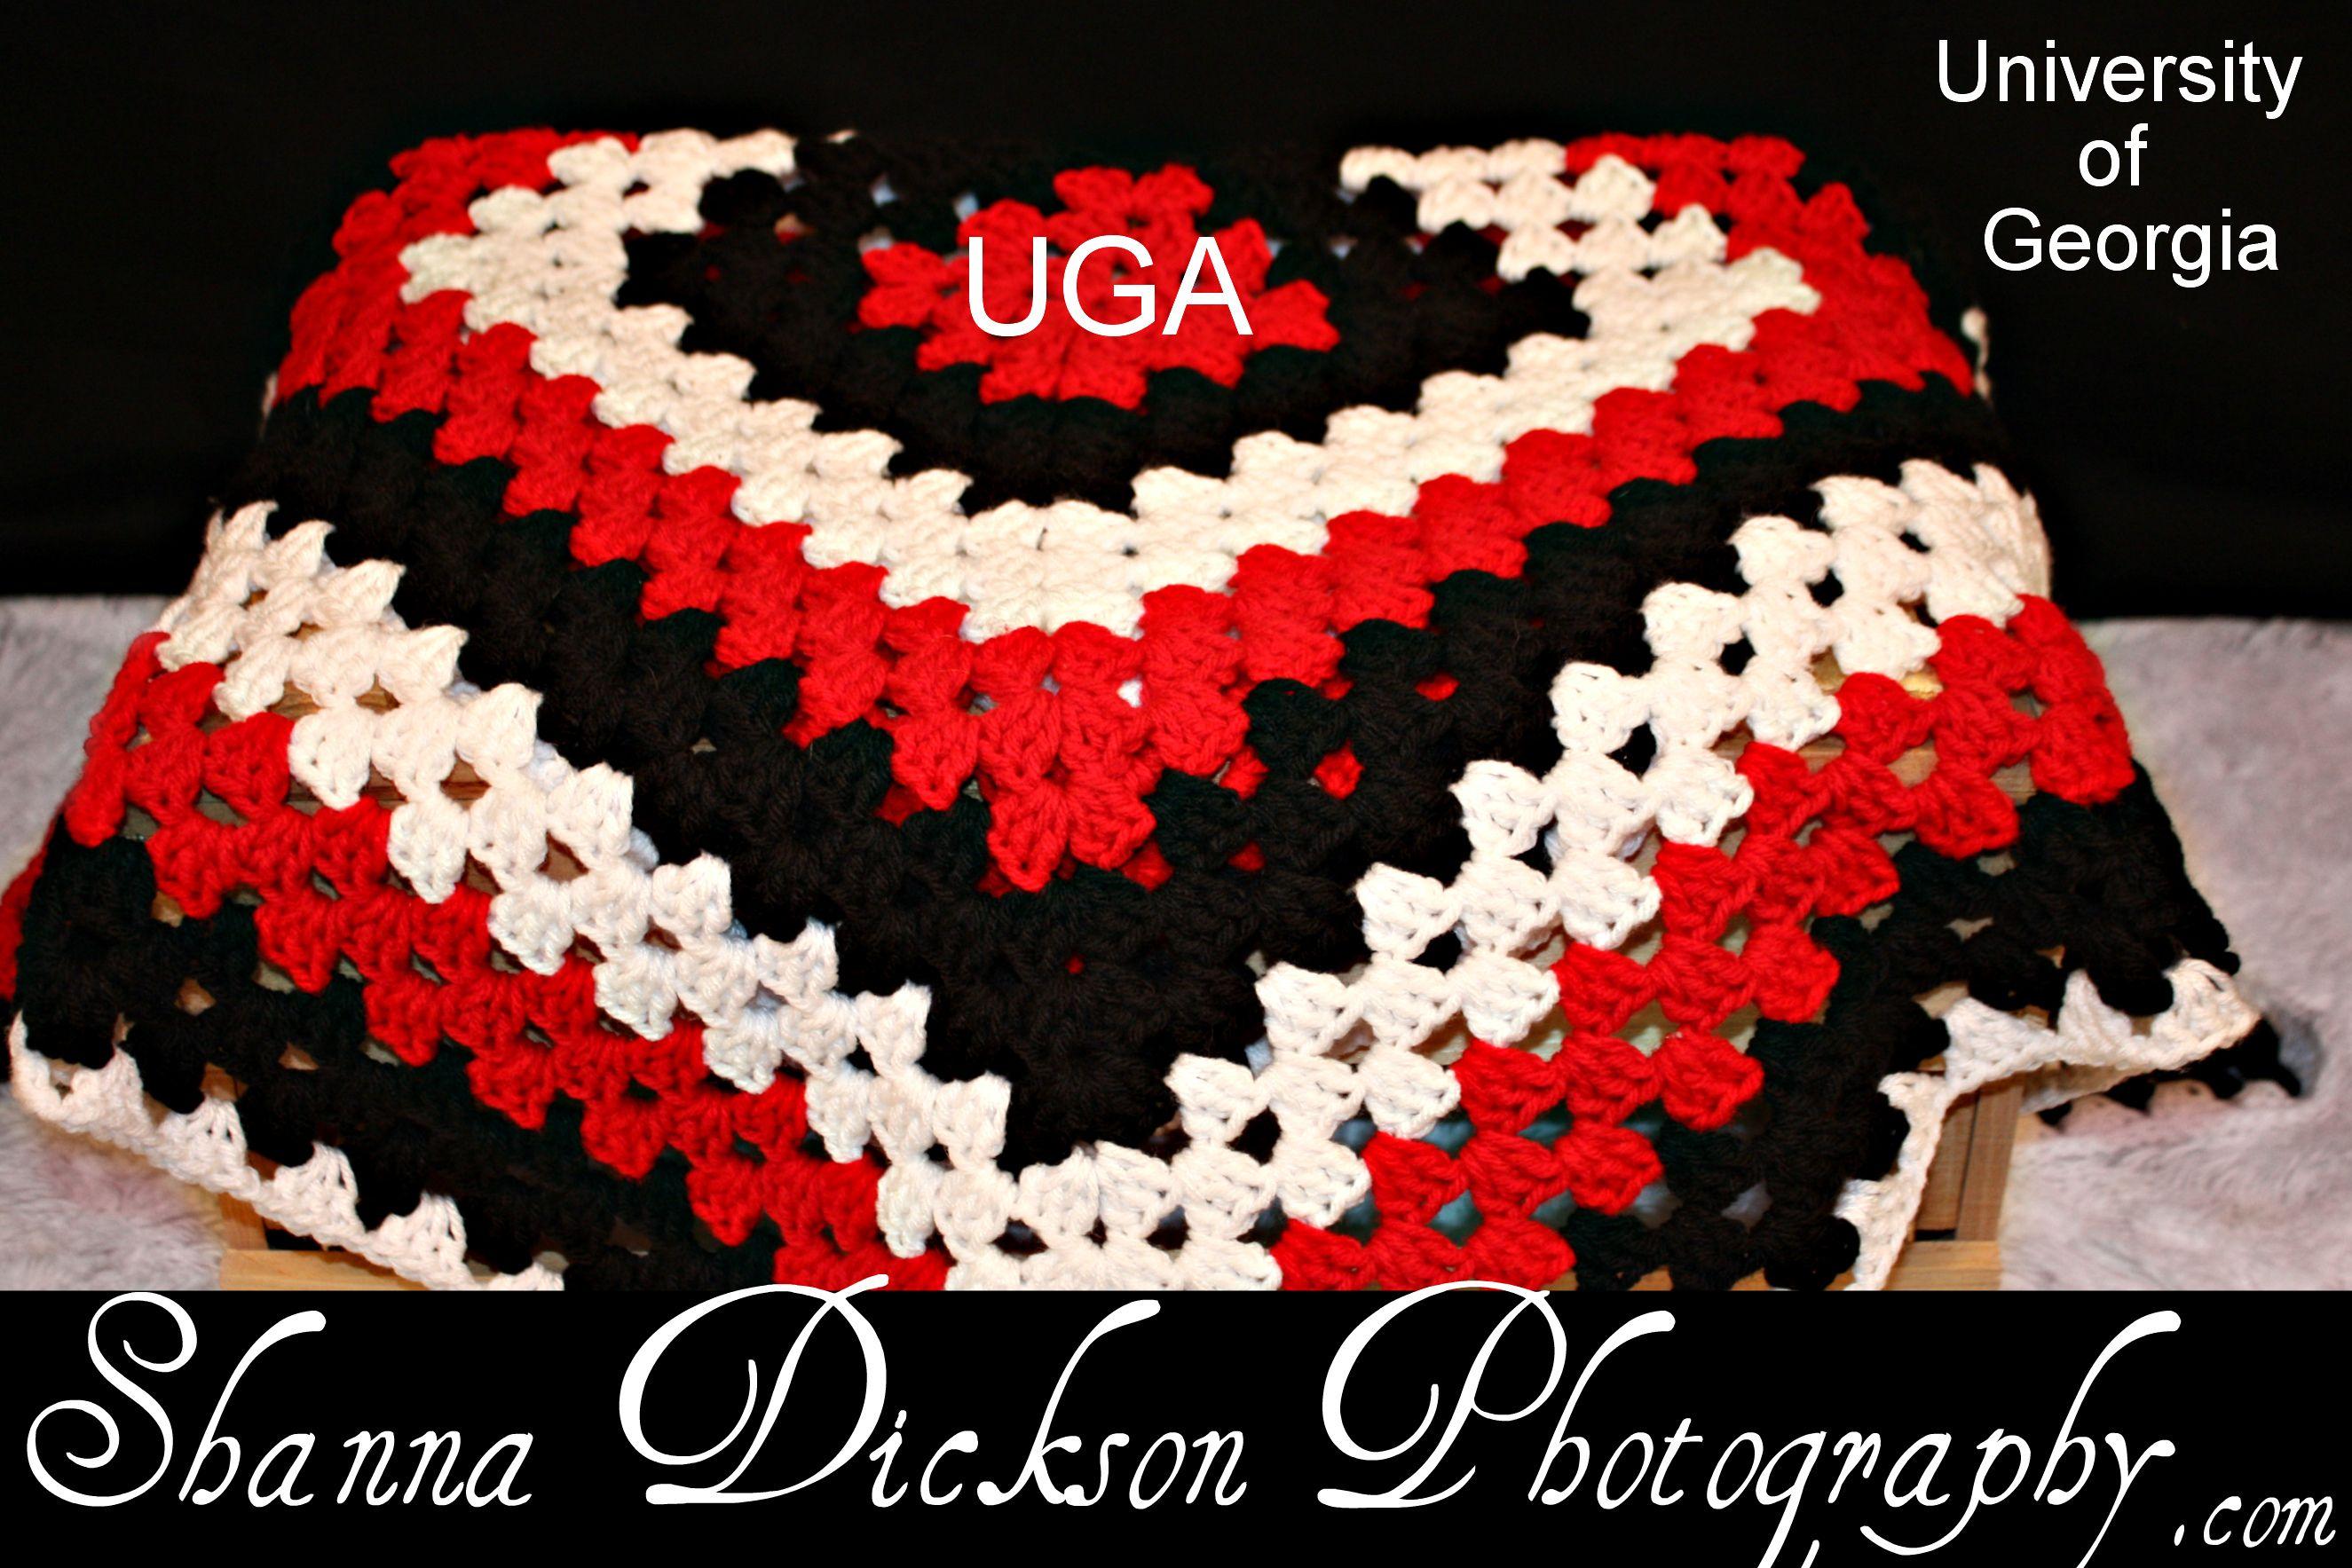 Uga Swaddle Me Mommy Baby Blanket By Crafty Crocheting Elithea